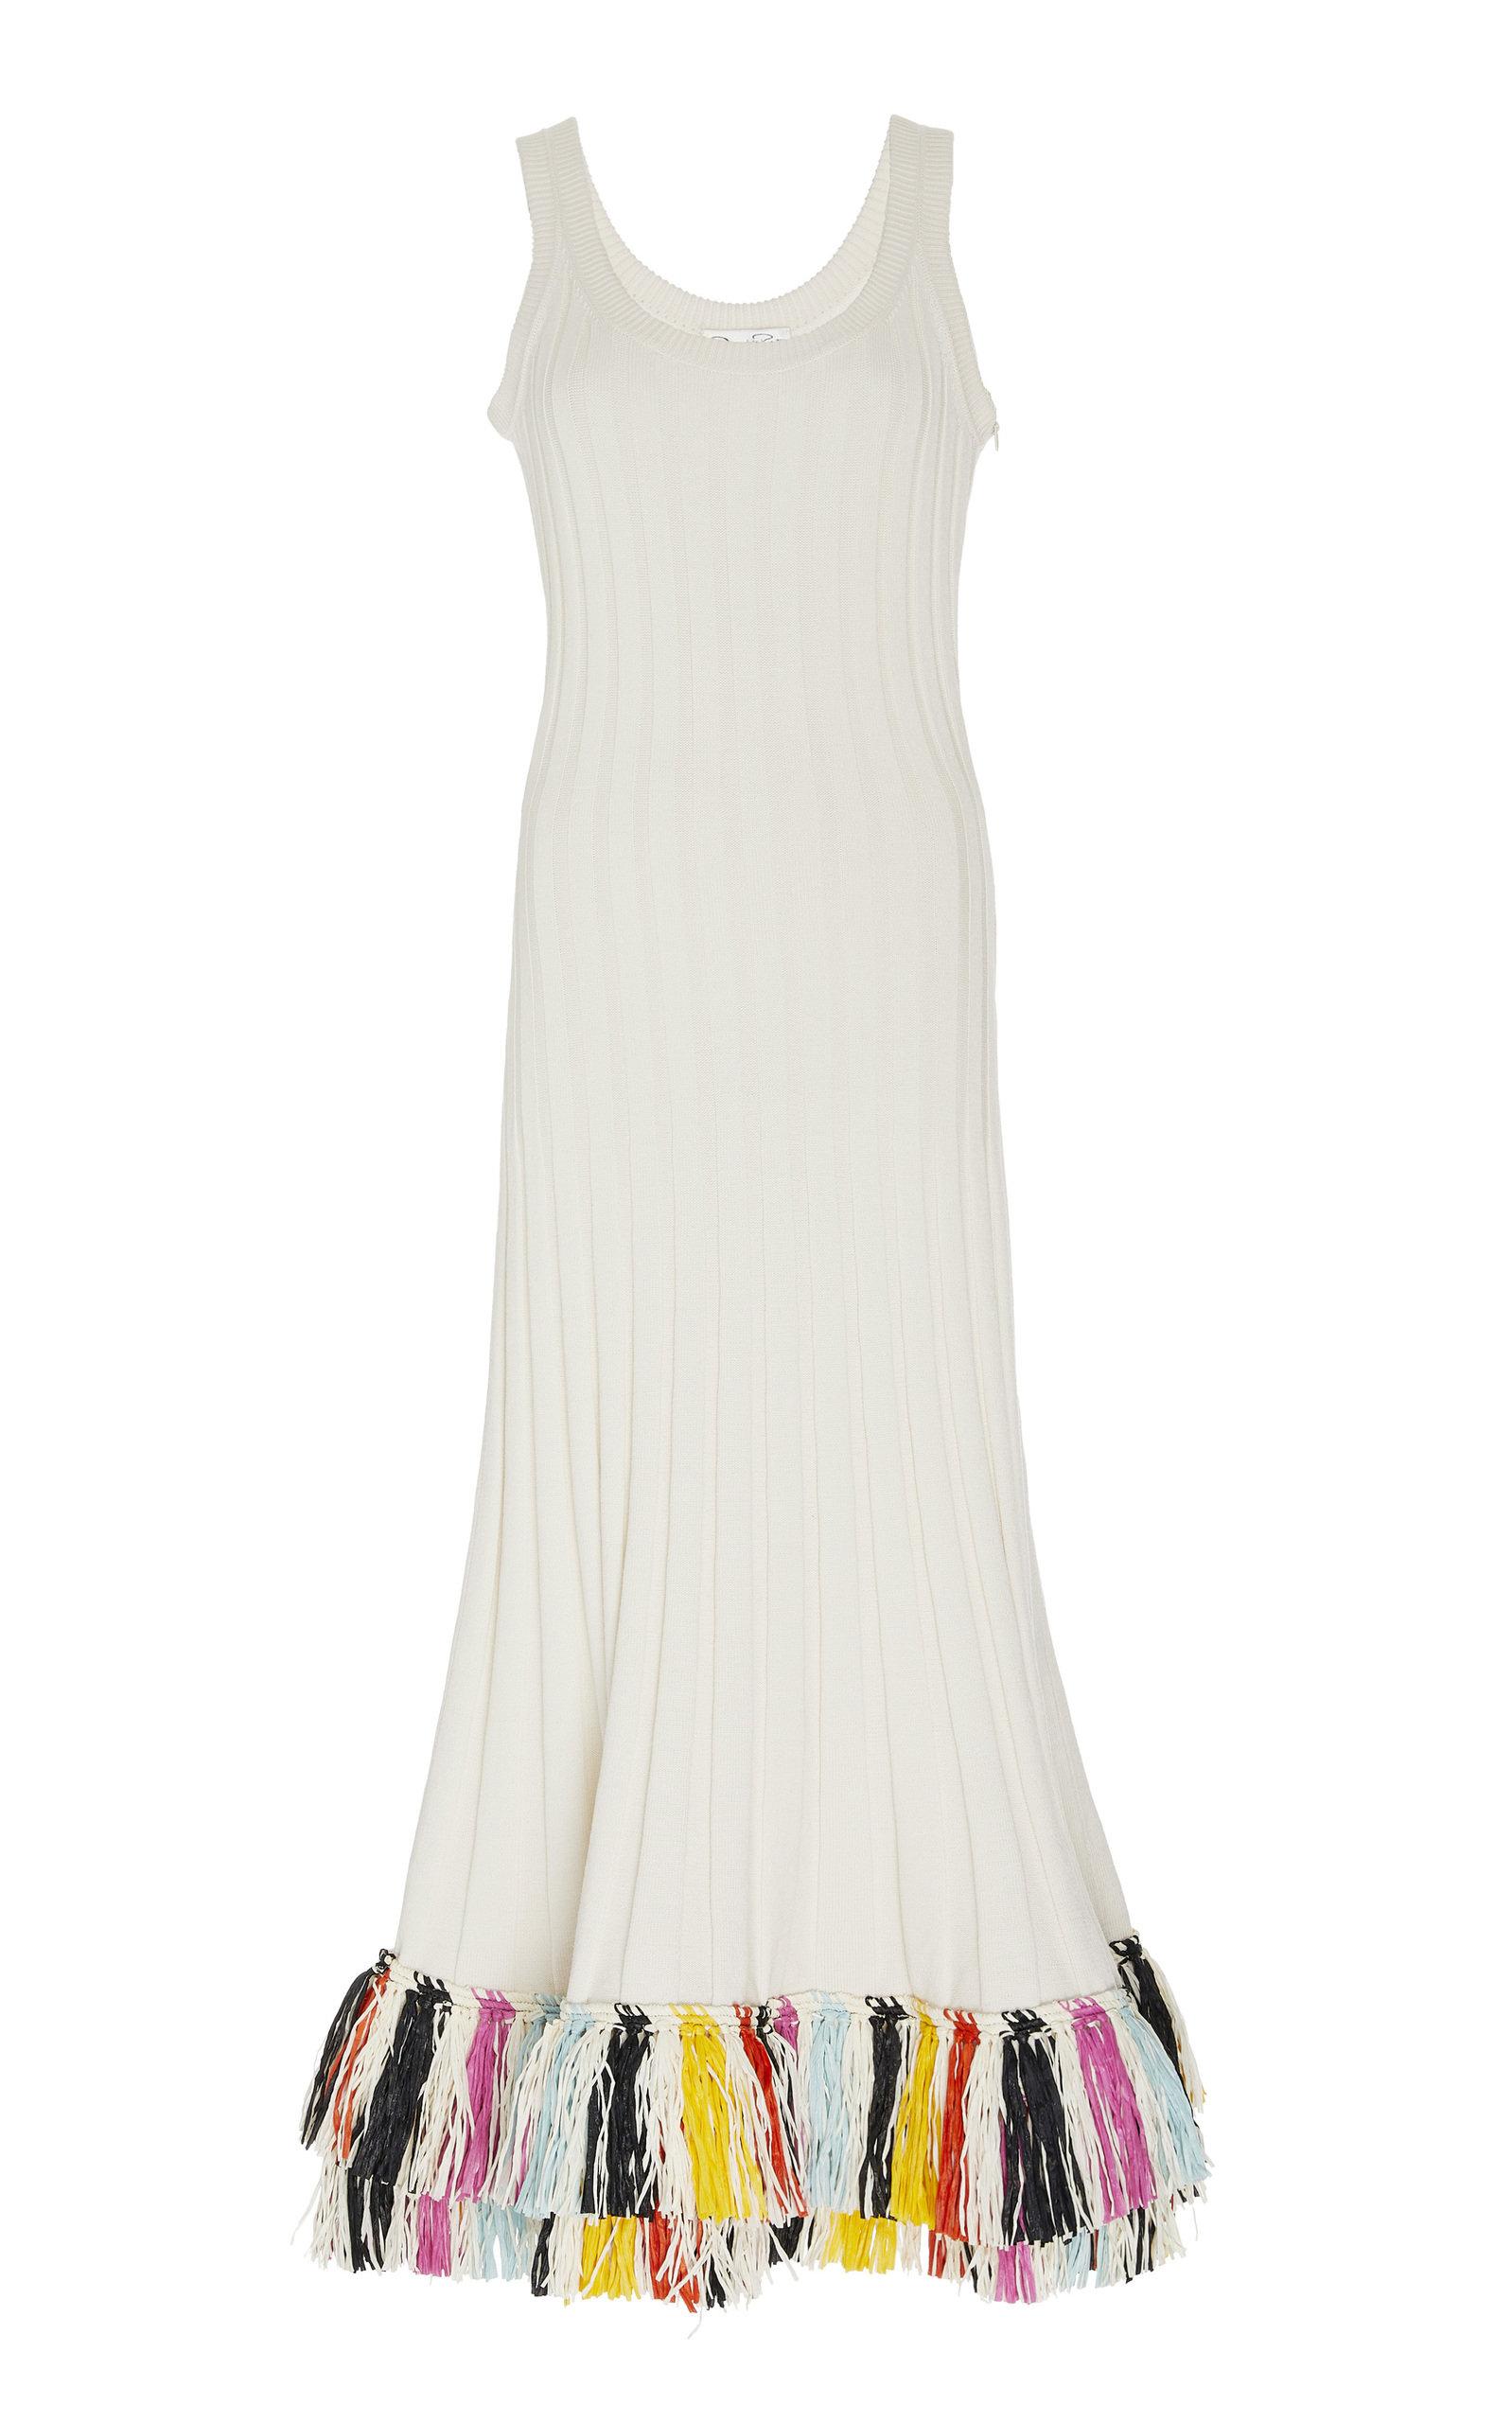 Buy Oscar de la Renta Fringed Silk-Blend Dress online, shop Oscar de la Renta at the best price